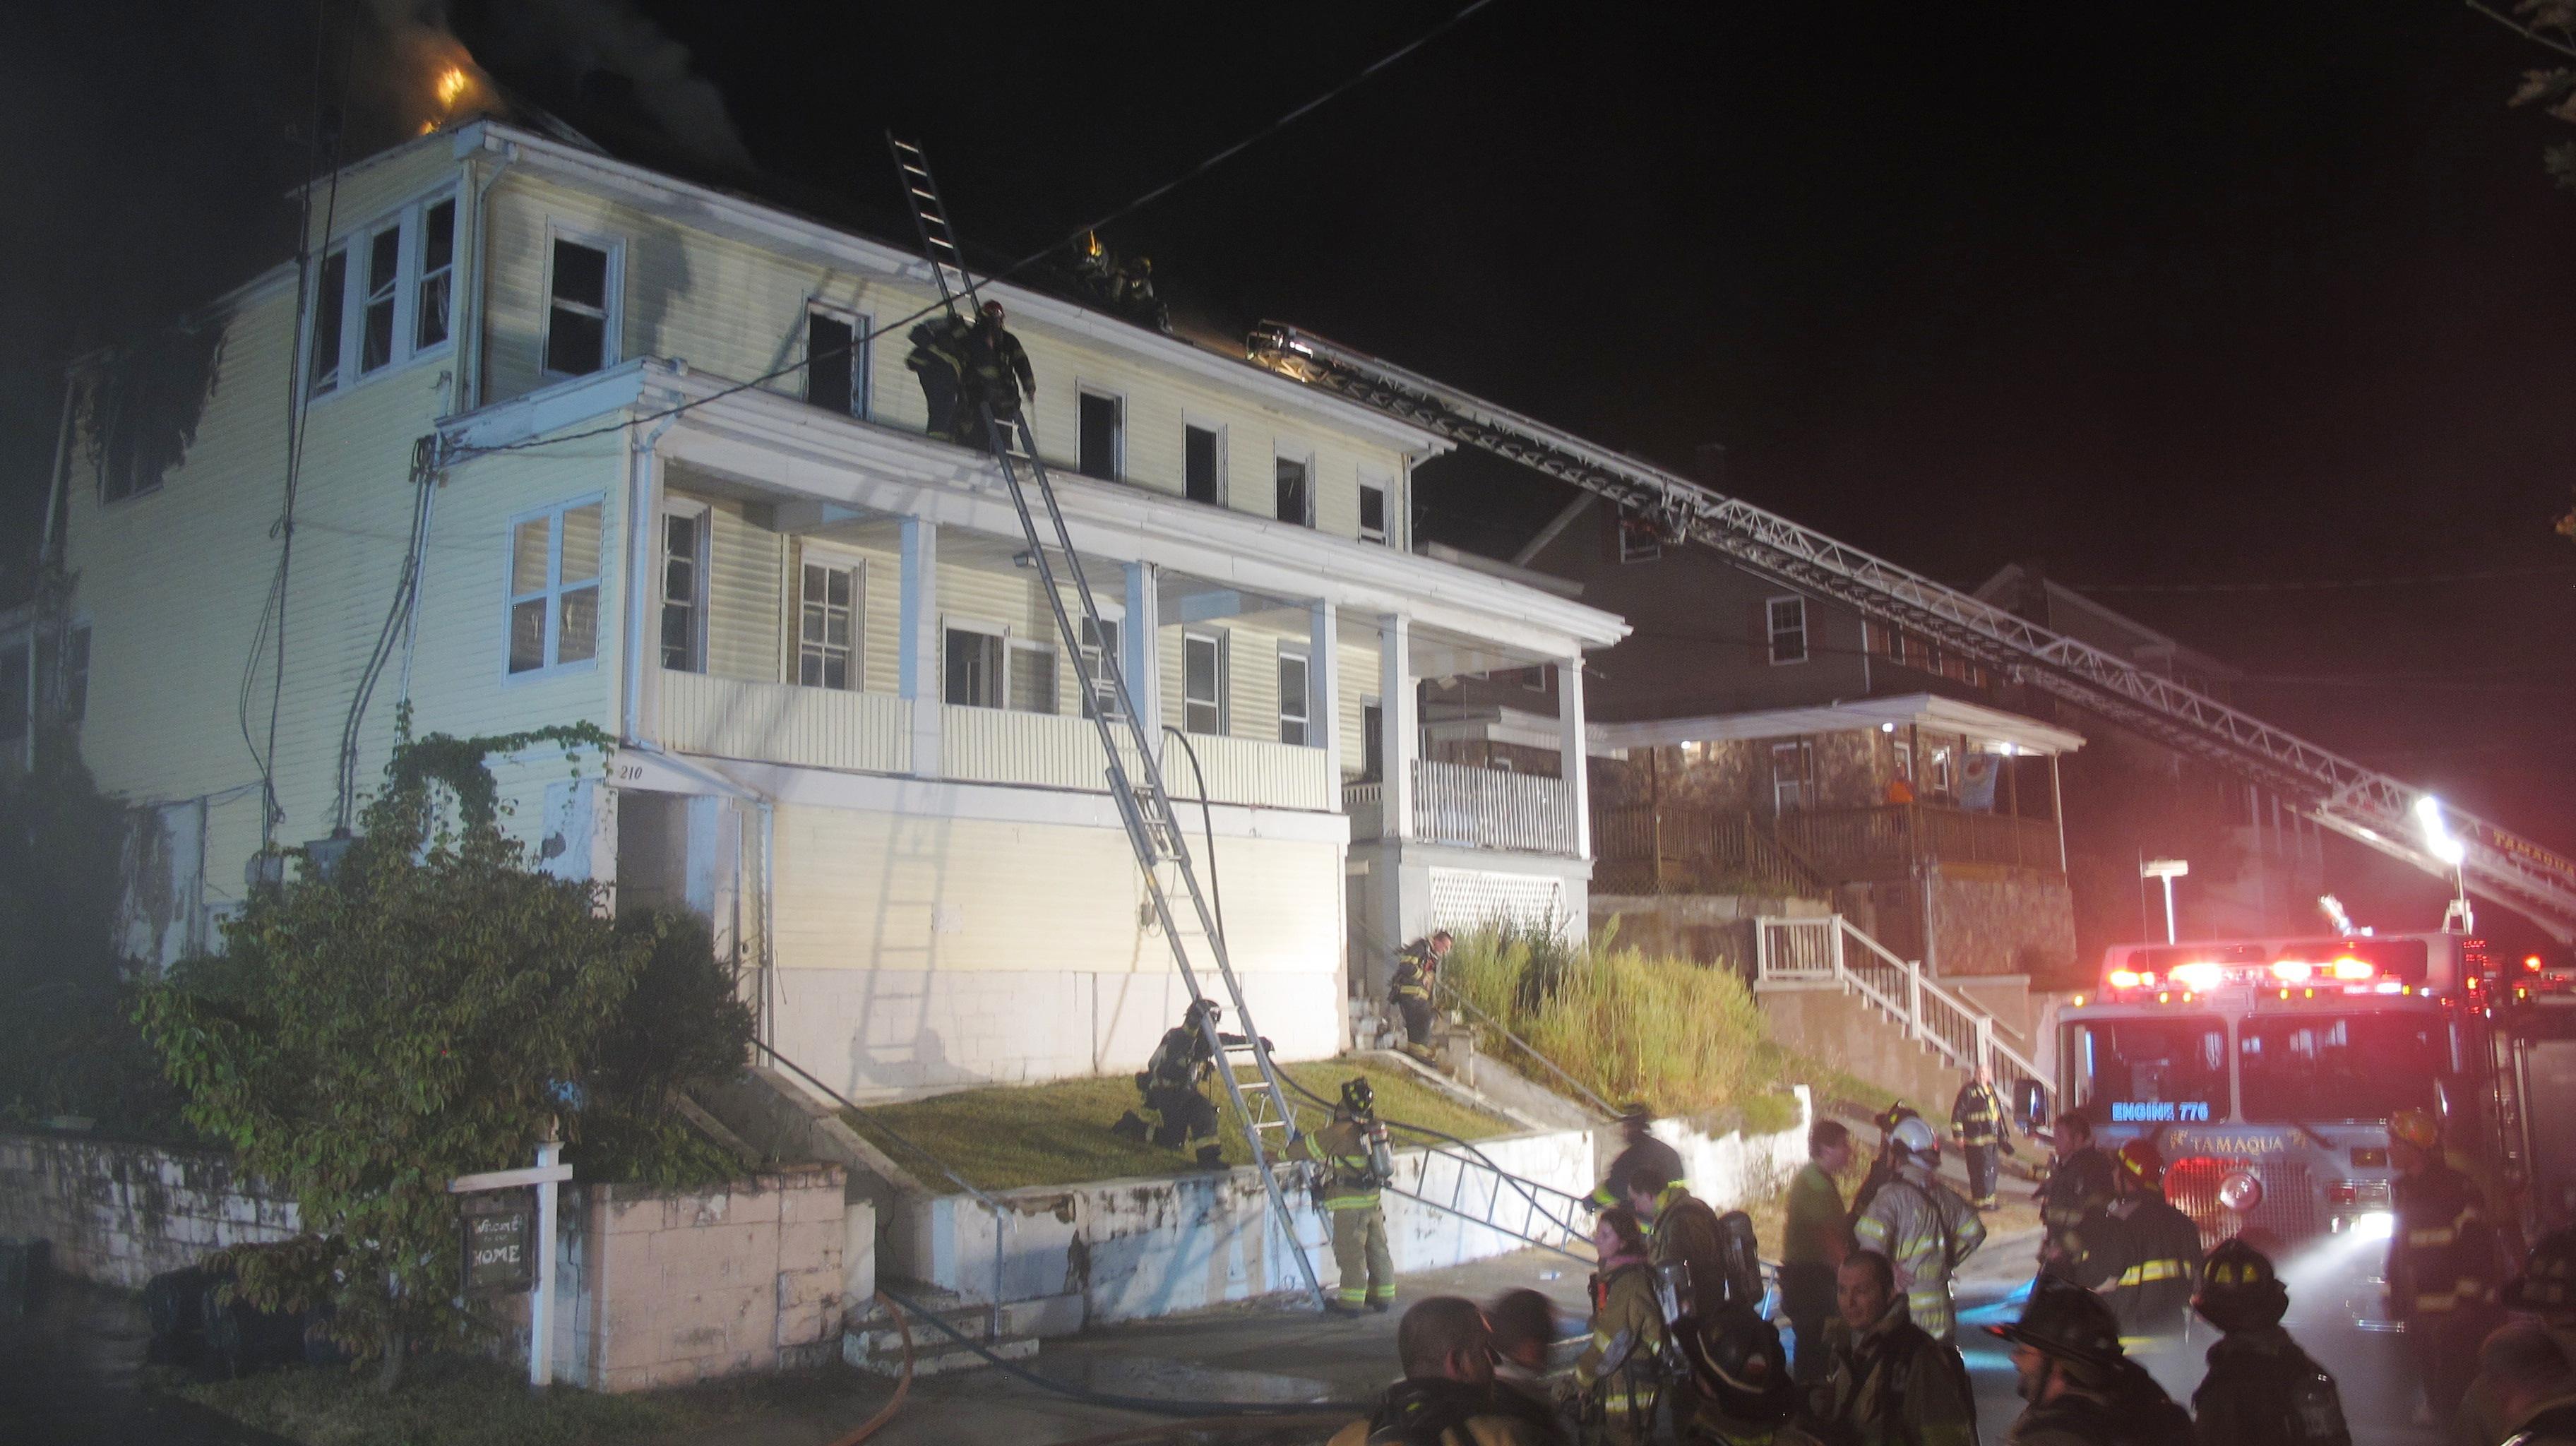 apartment-building-fire-210-washington-street-tamaqua-9-9-2015-92